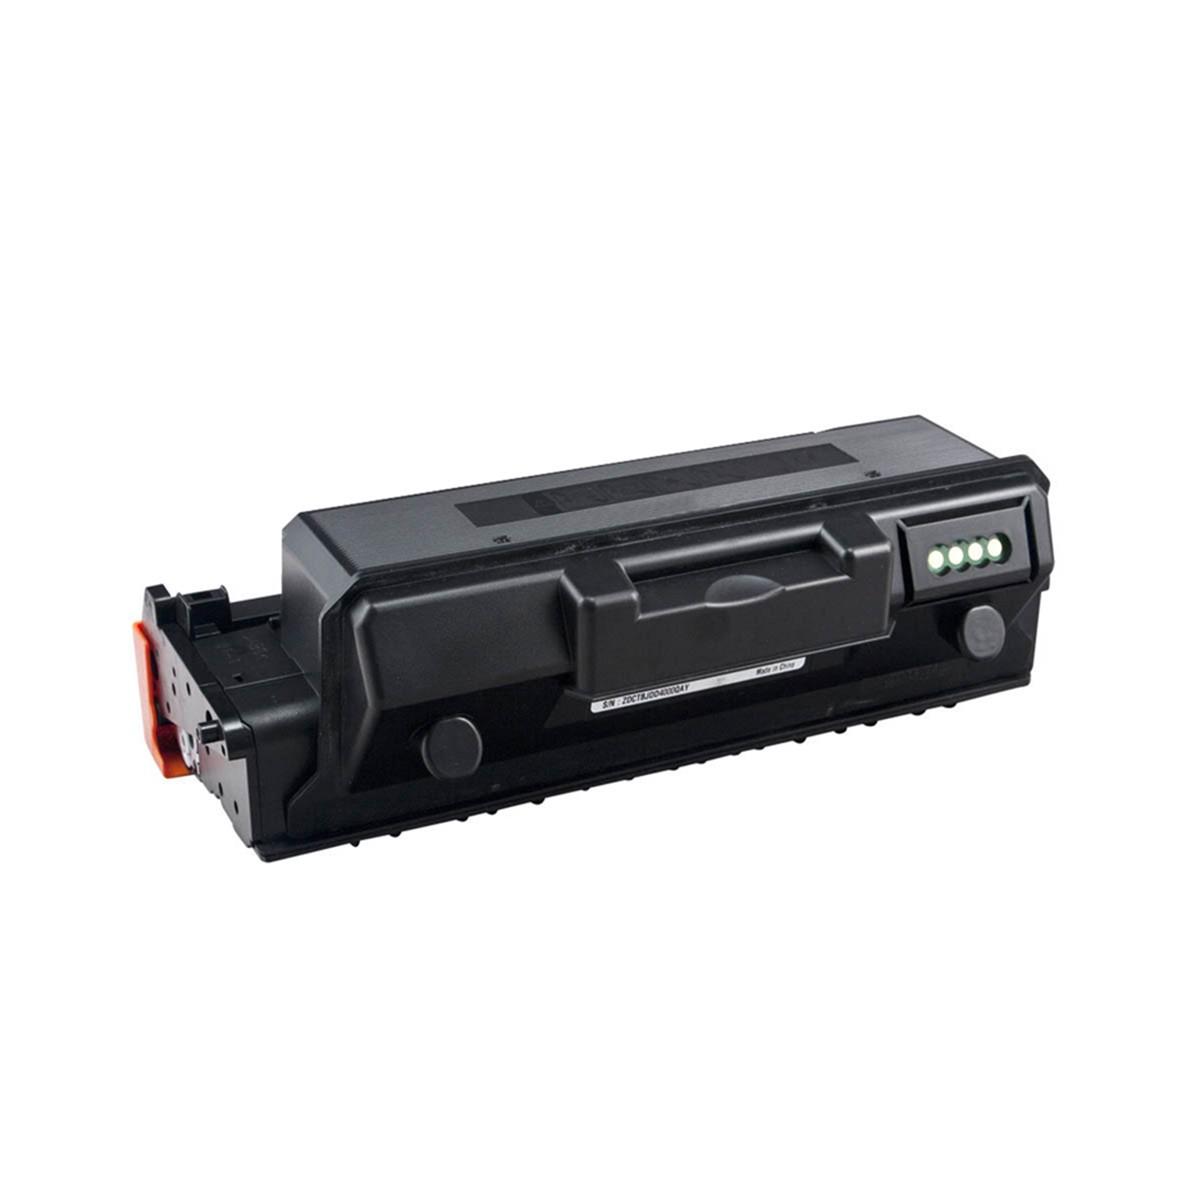 Toner Compativel D204L D204 204 - M3825 M4025 M3325 M3875 M3375 M4075 DO-ADU8-IP1Y